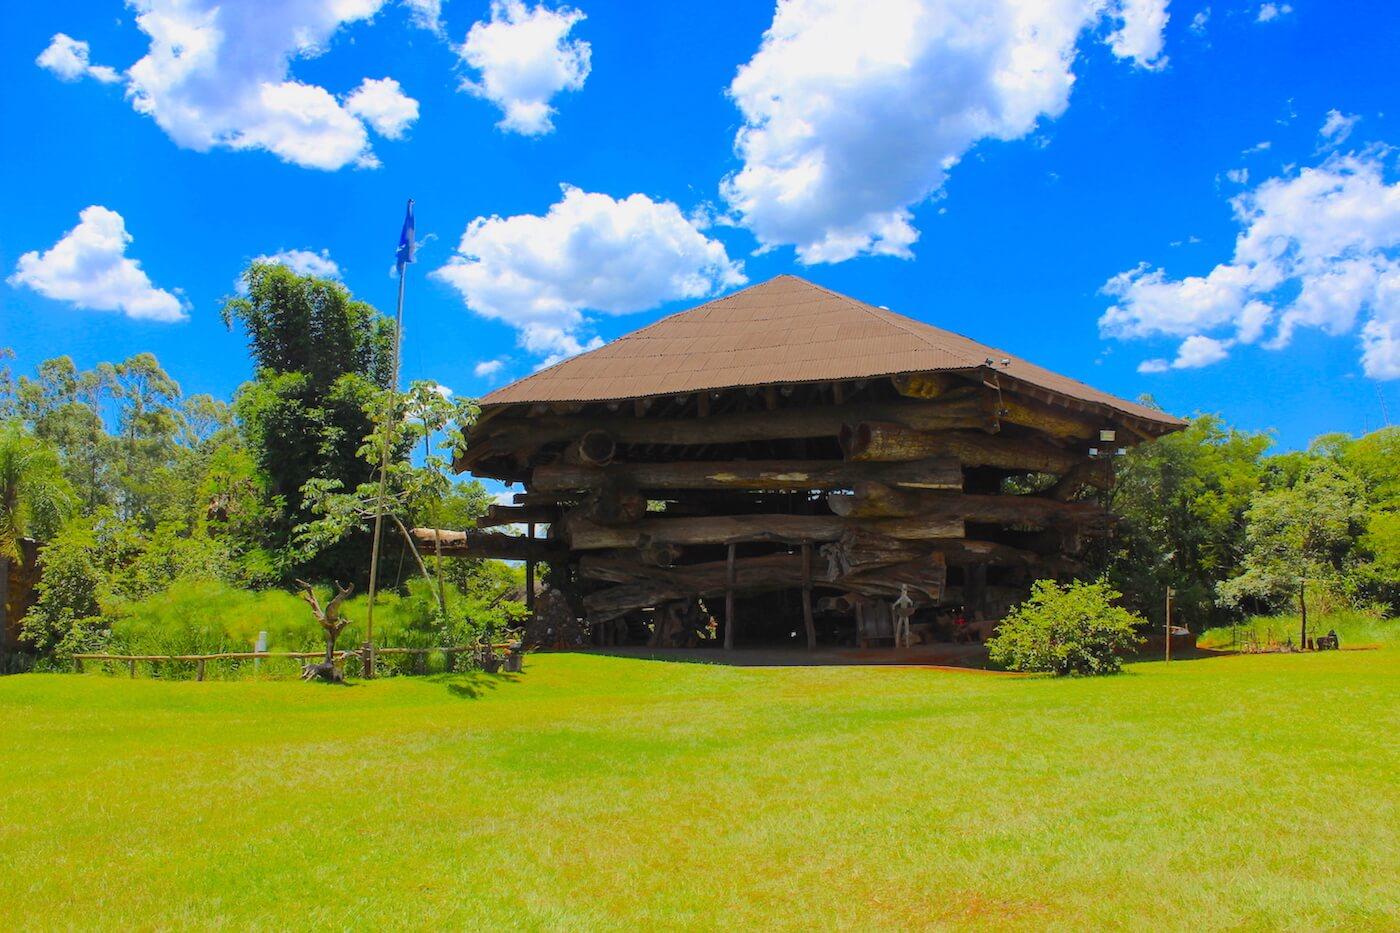 la aripuca wooden structure